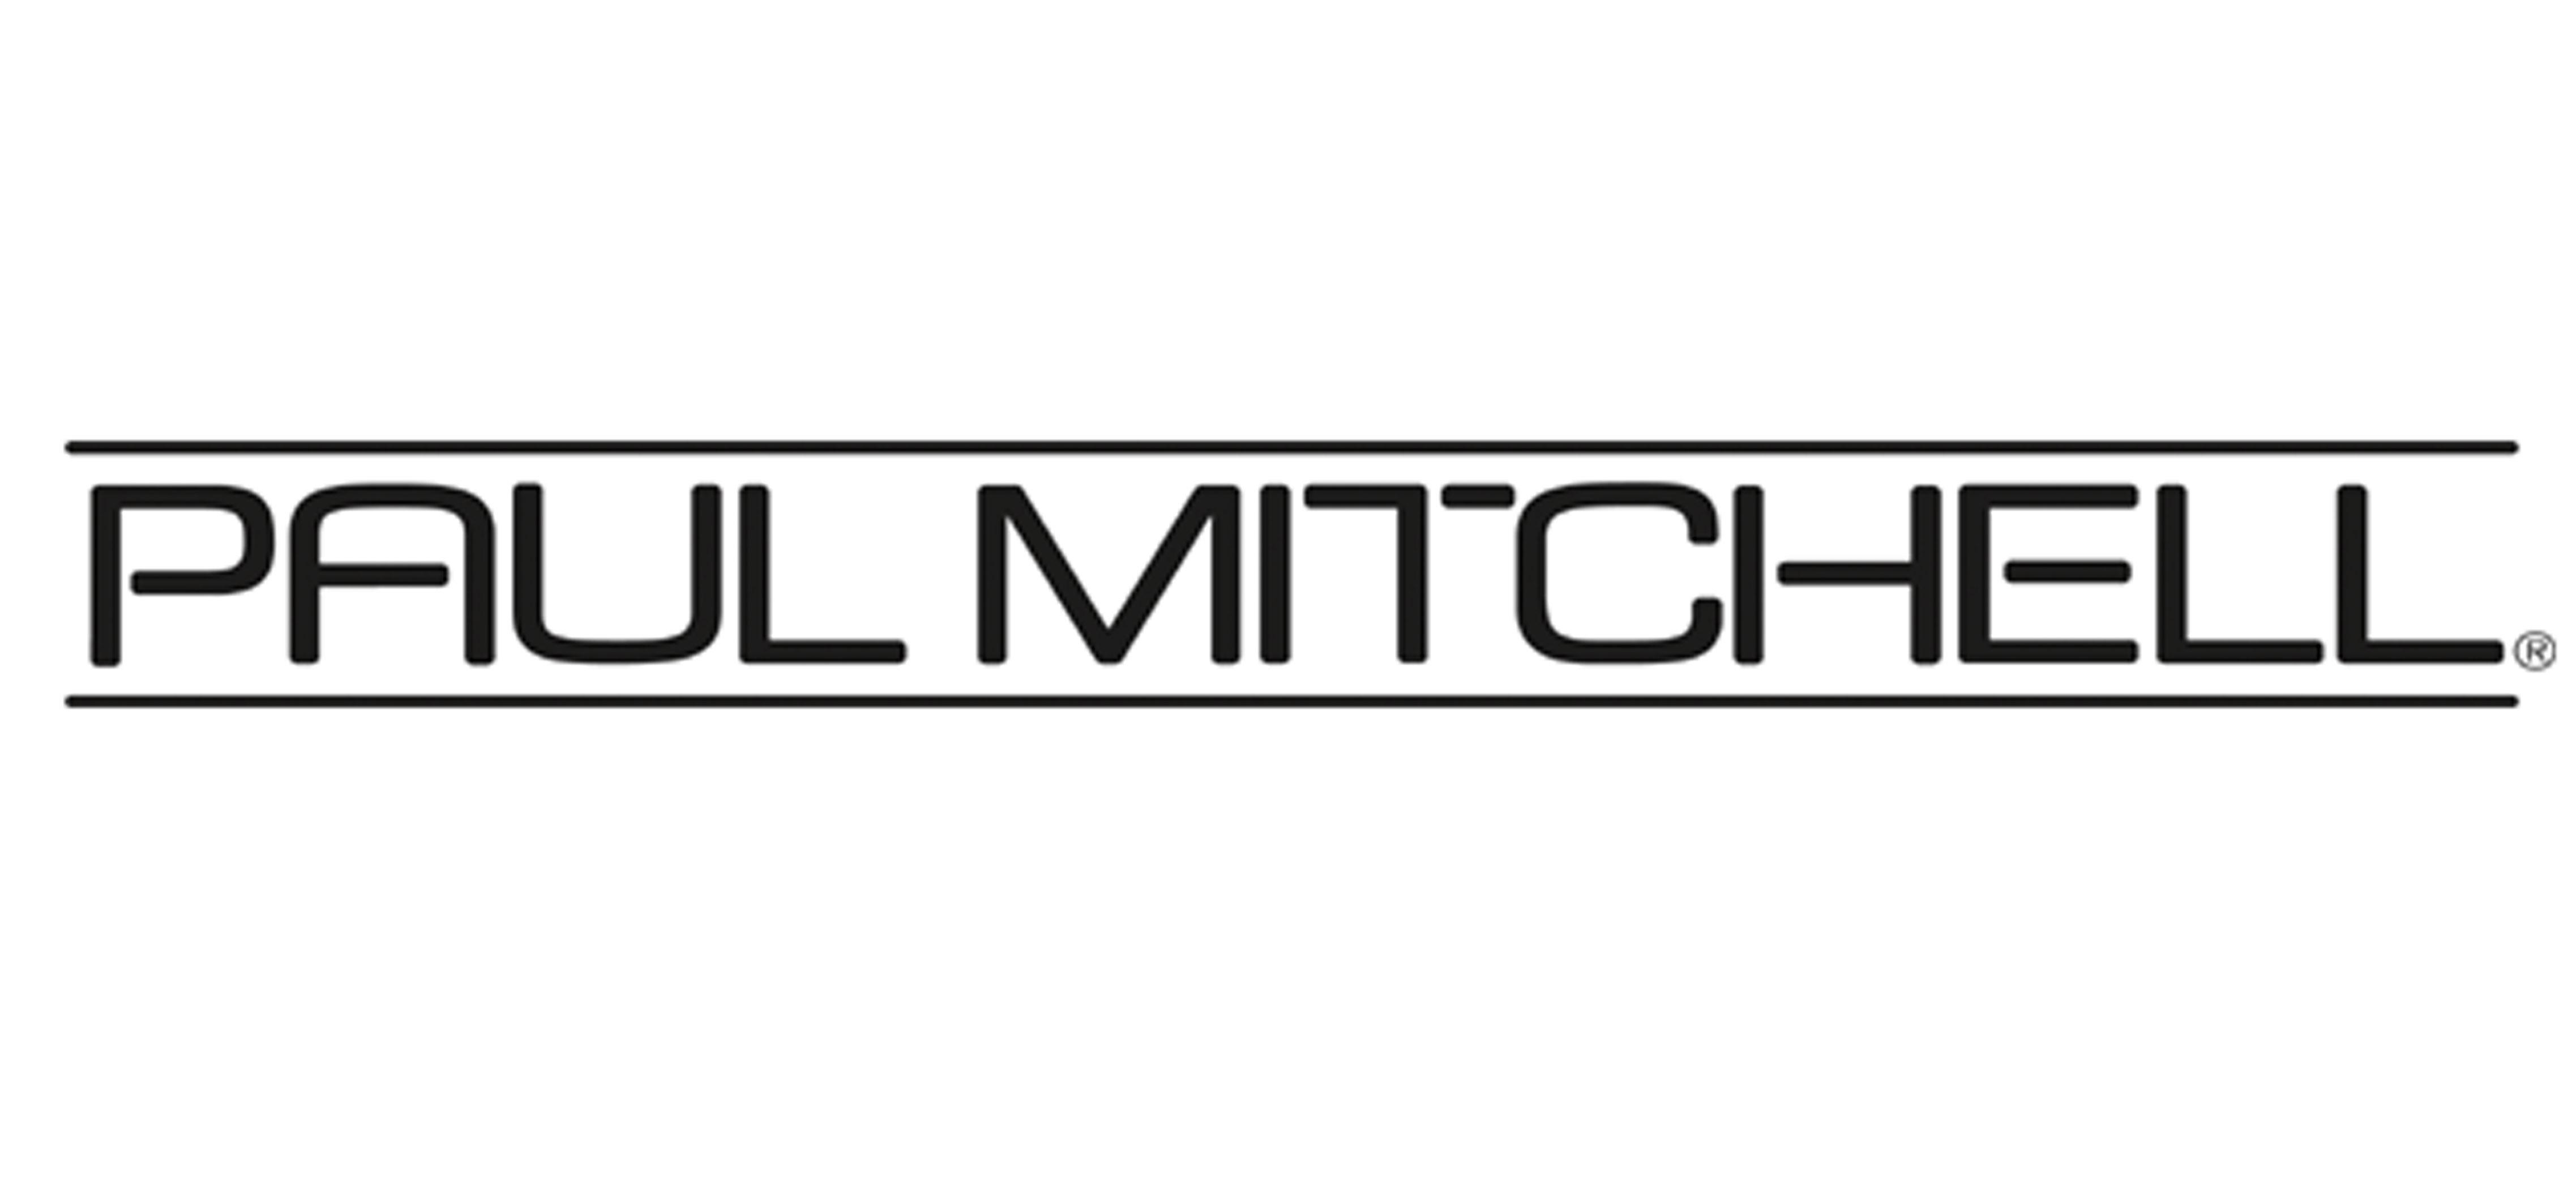 Paul Mitchell. Tu marca de confianza.